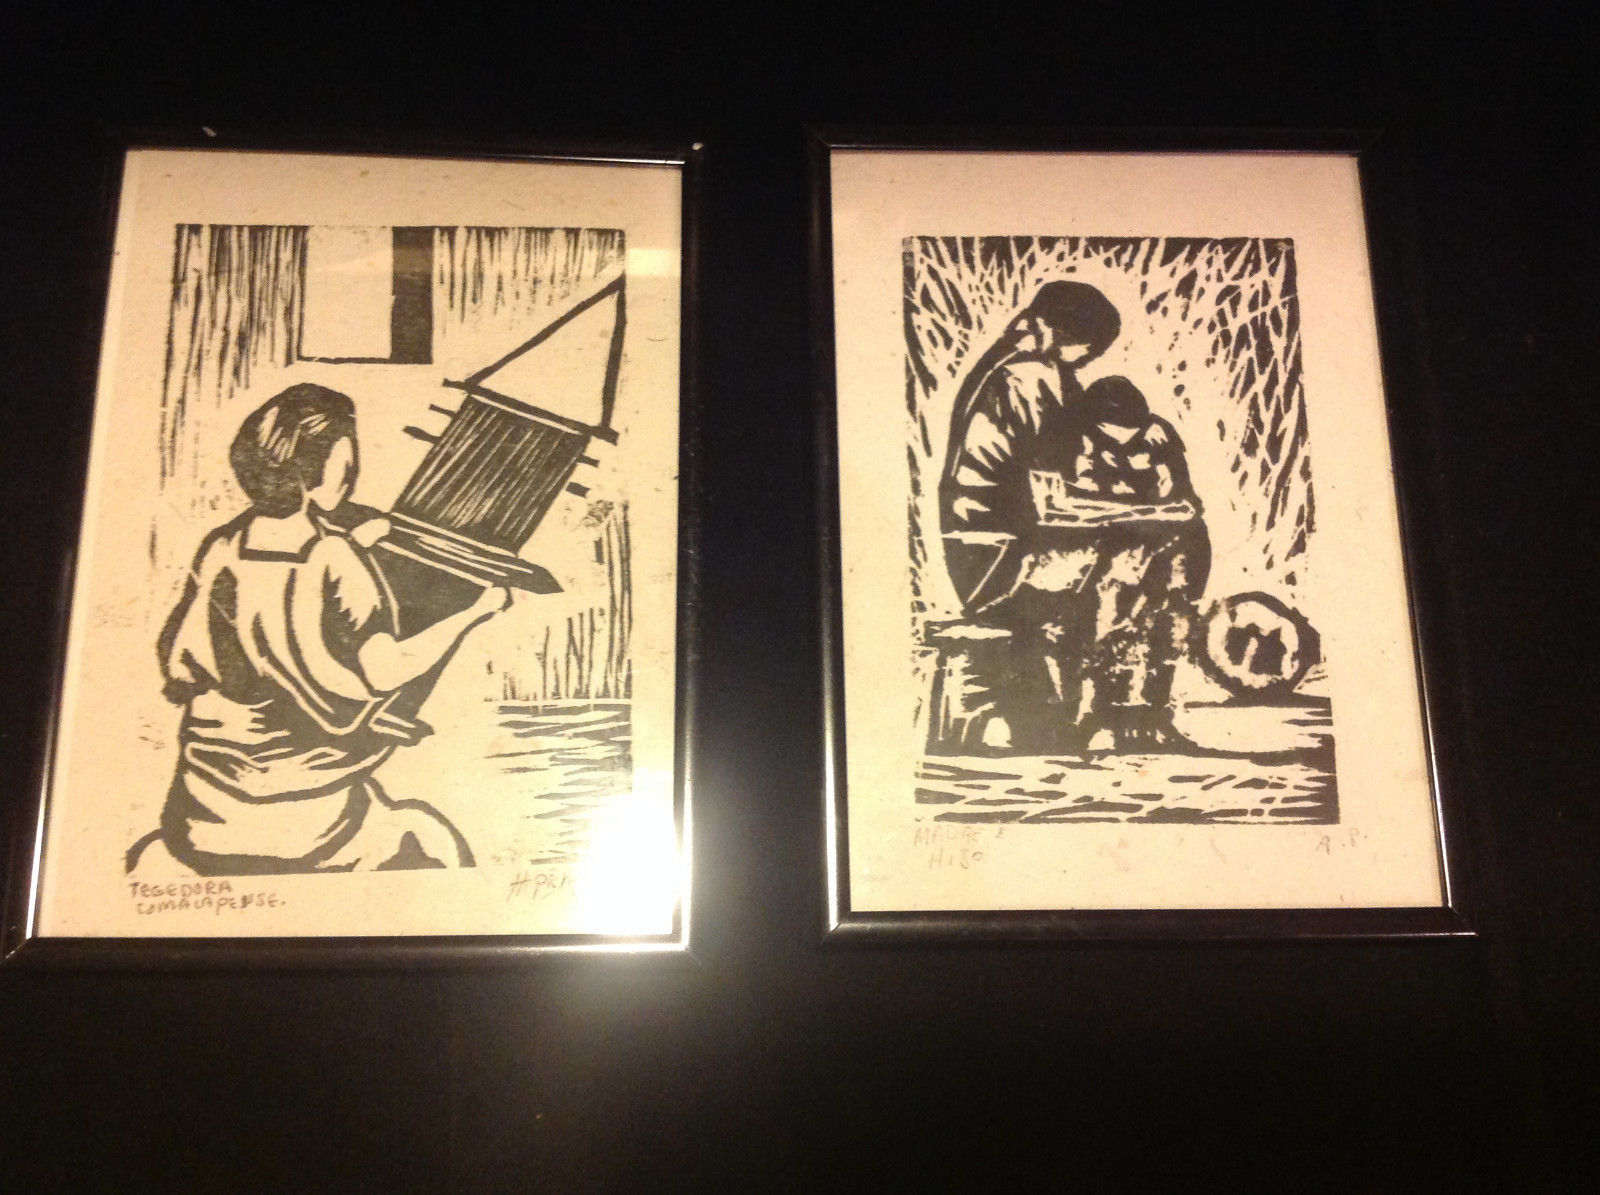 TWO Original Wood cut block prints Black Frames Guatemalan Artist